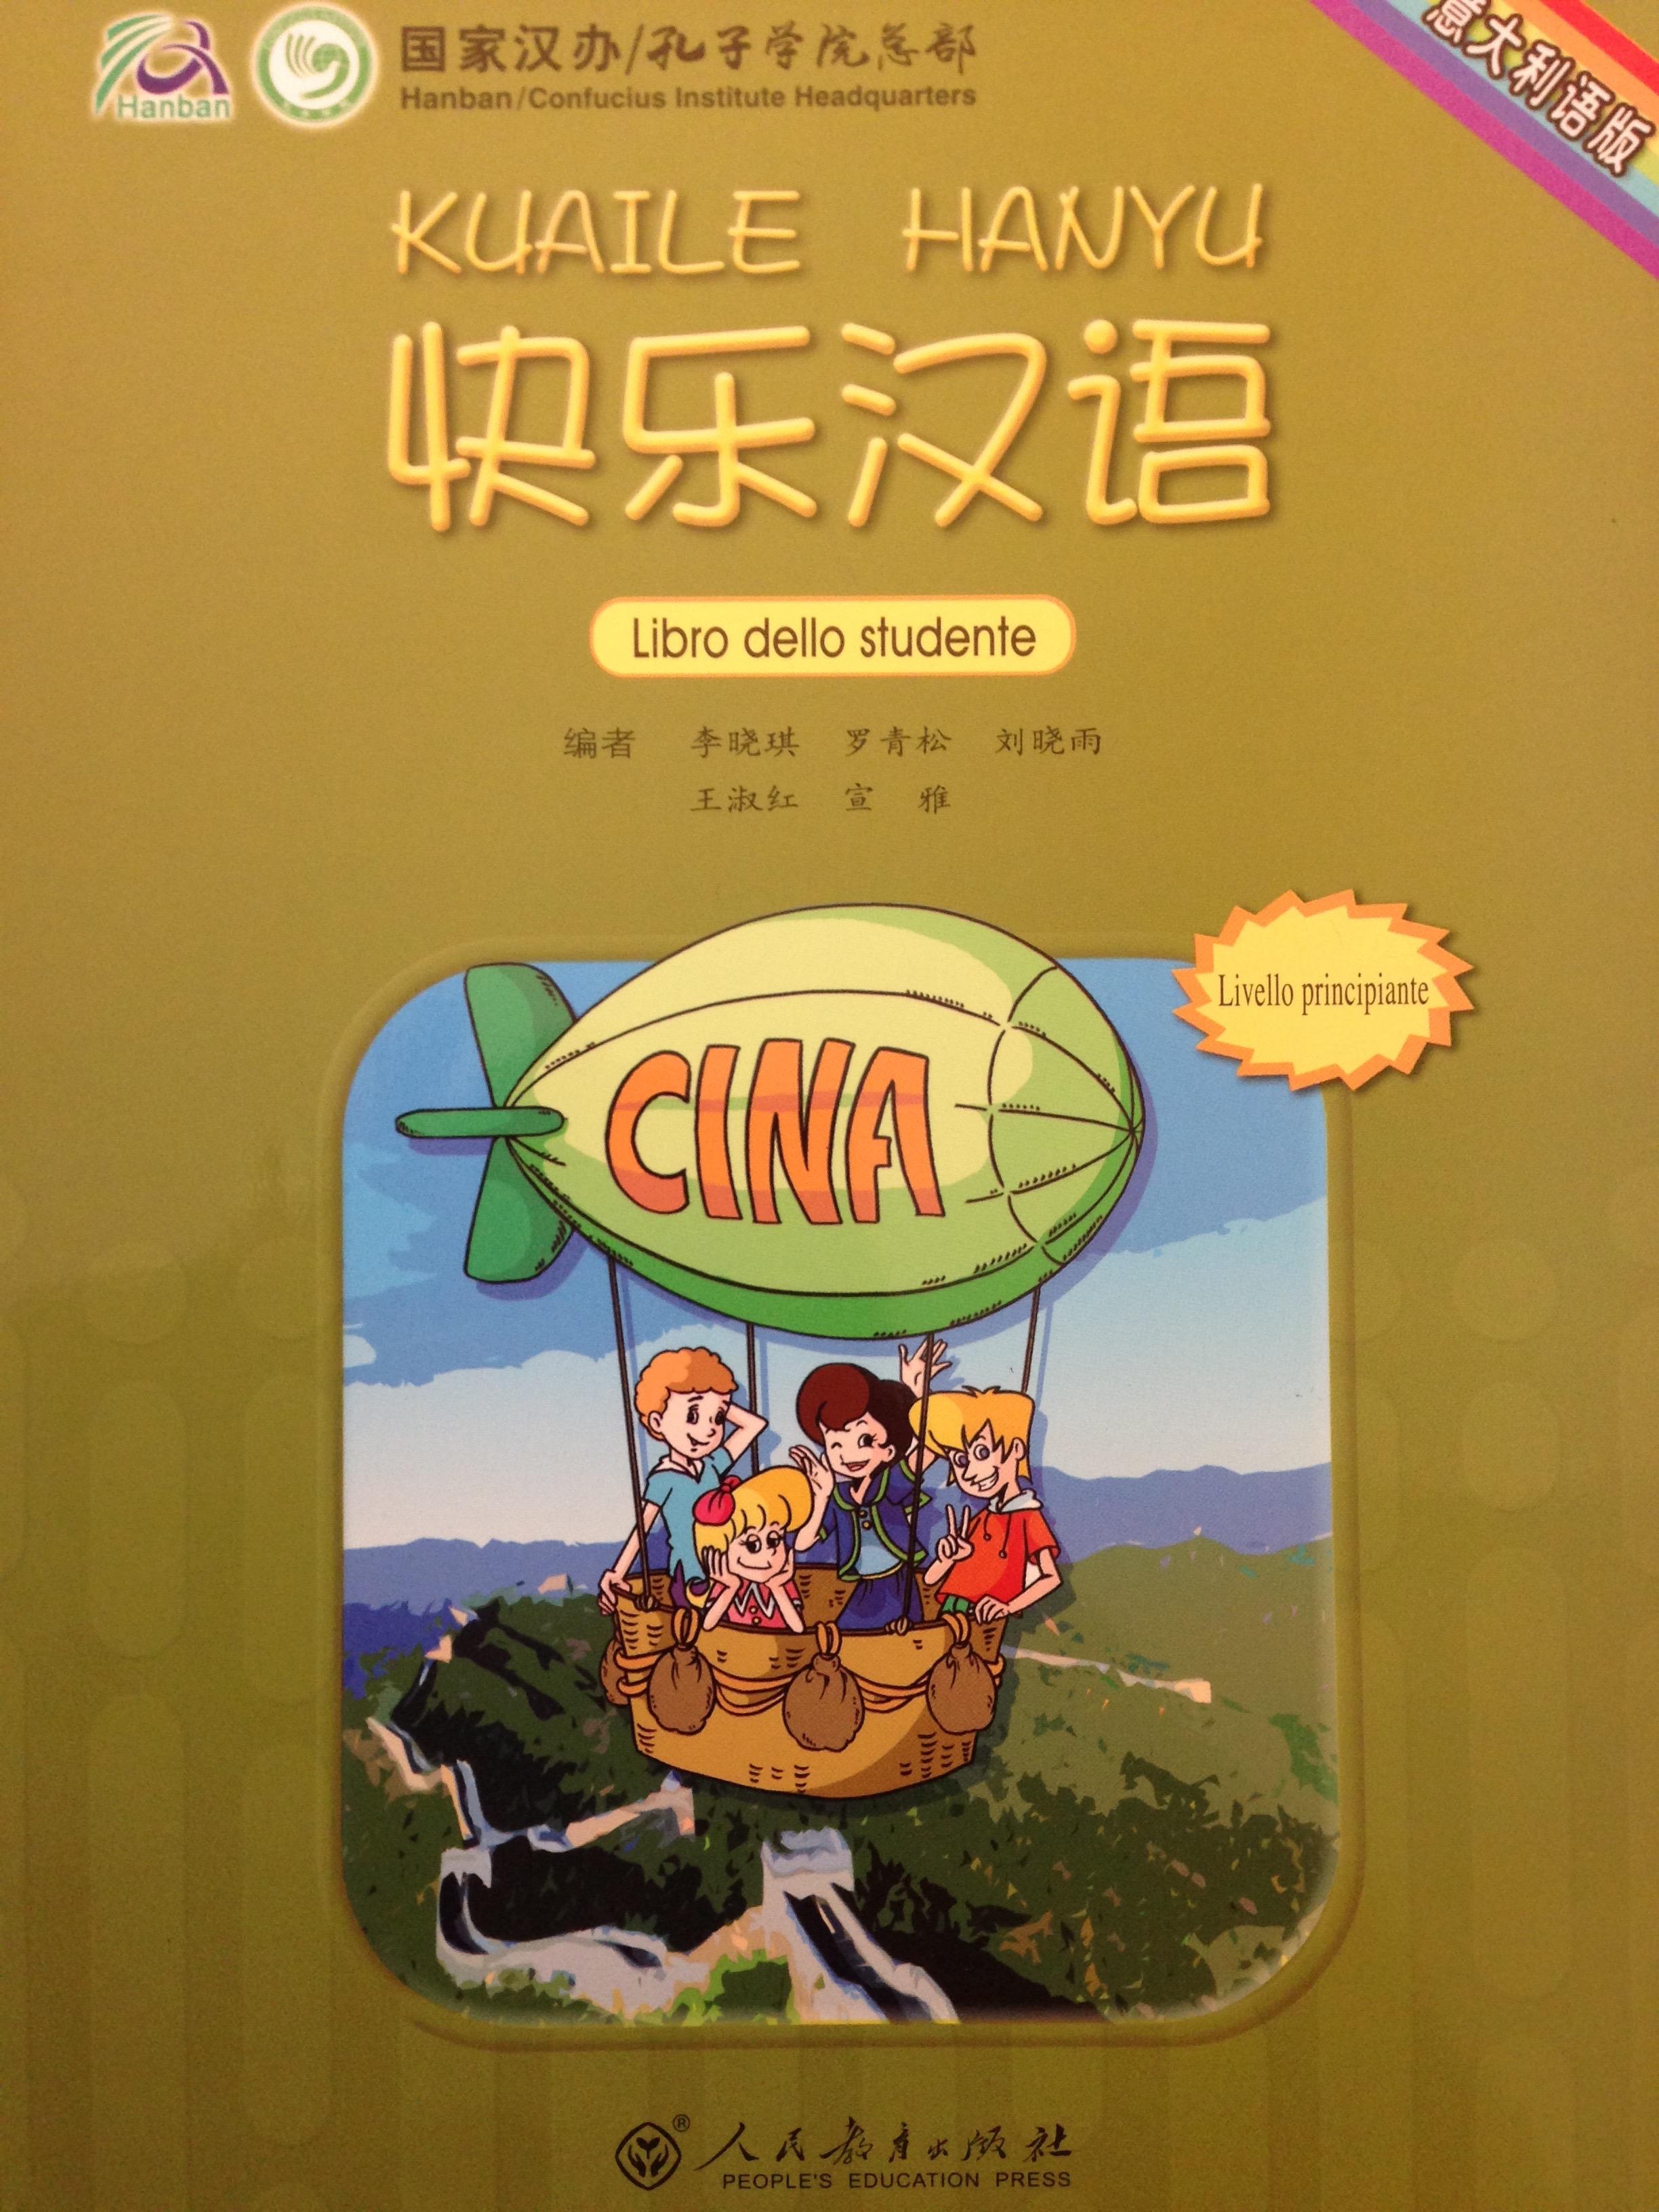 kuaile hanyu book 2 pdf